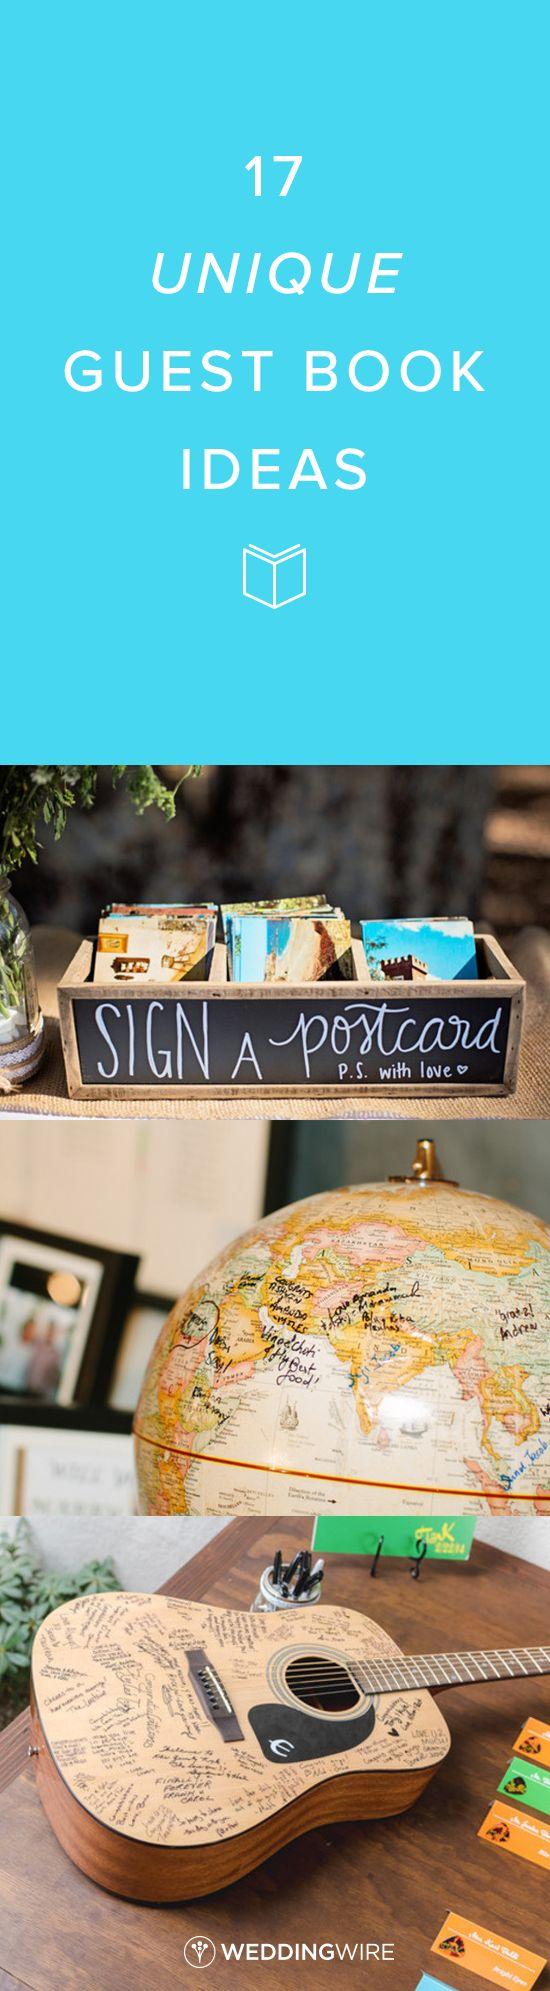 wedding ideas etiquette advice hacks every couple should know